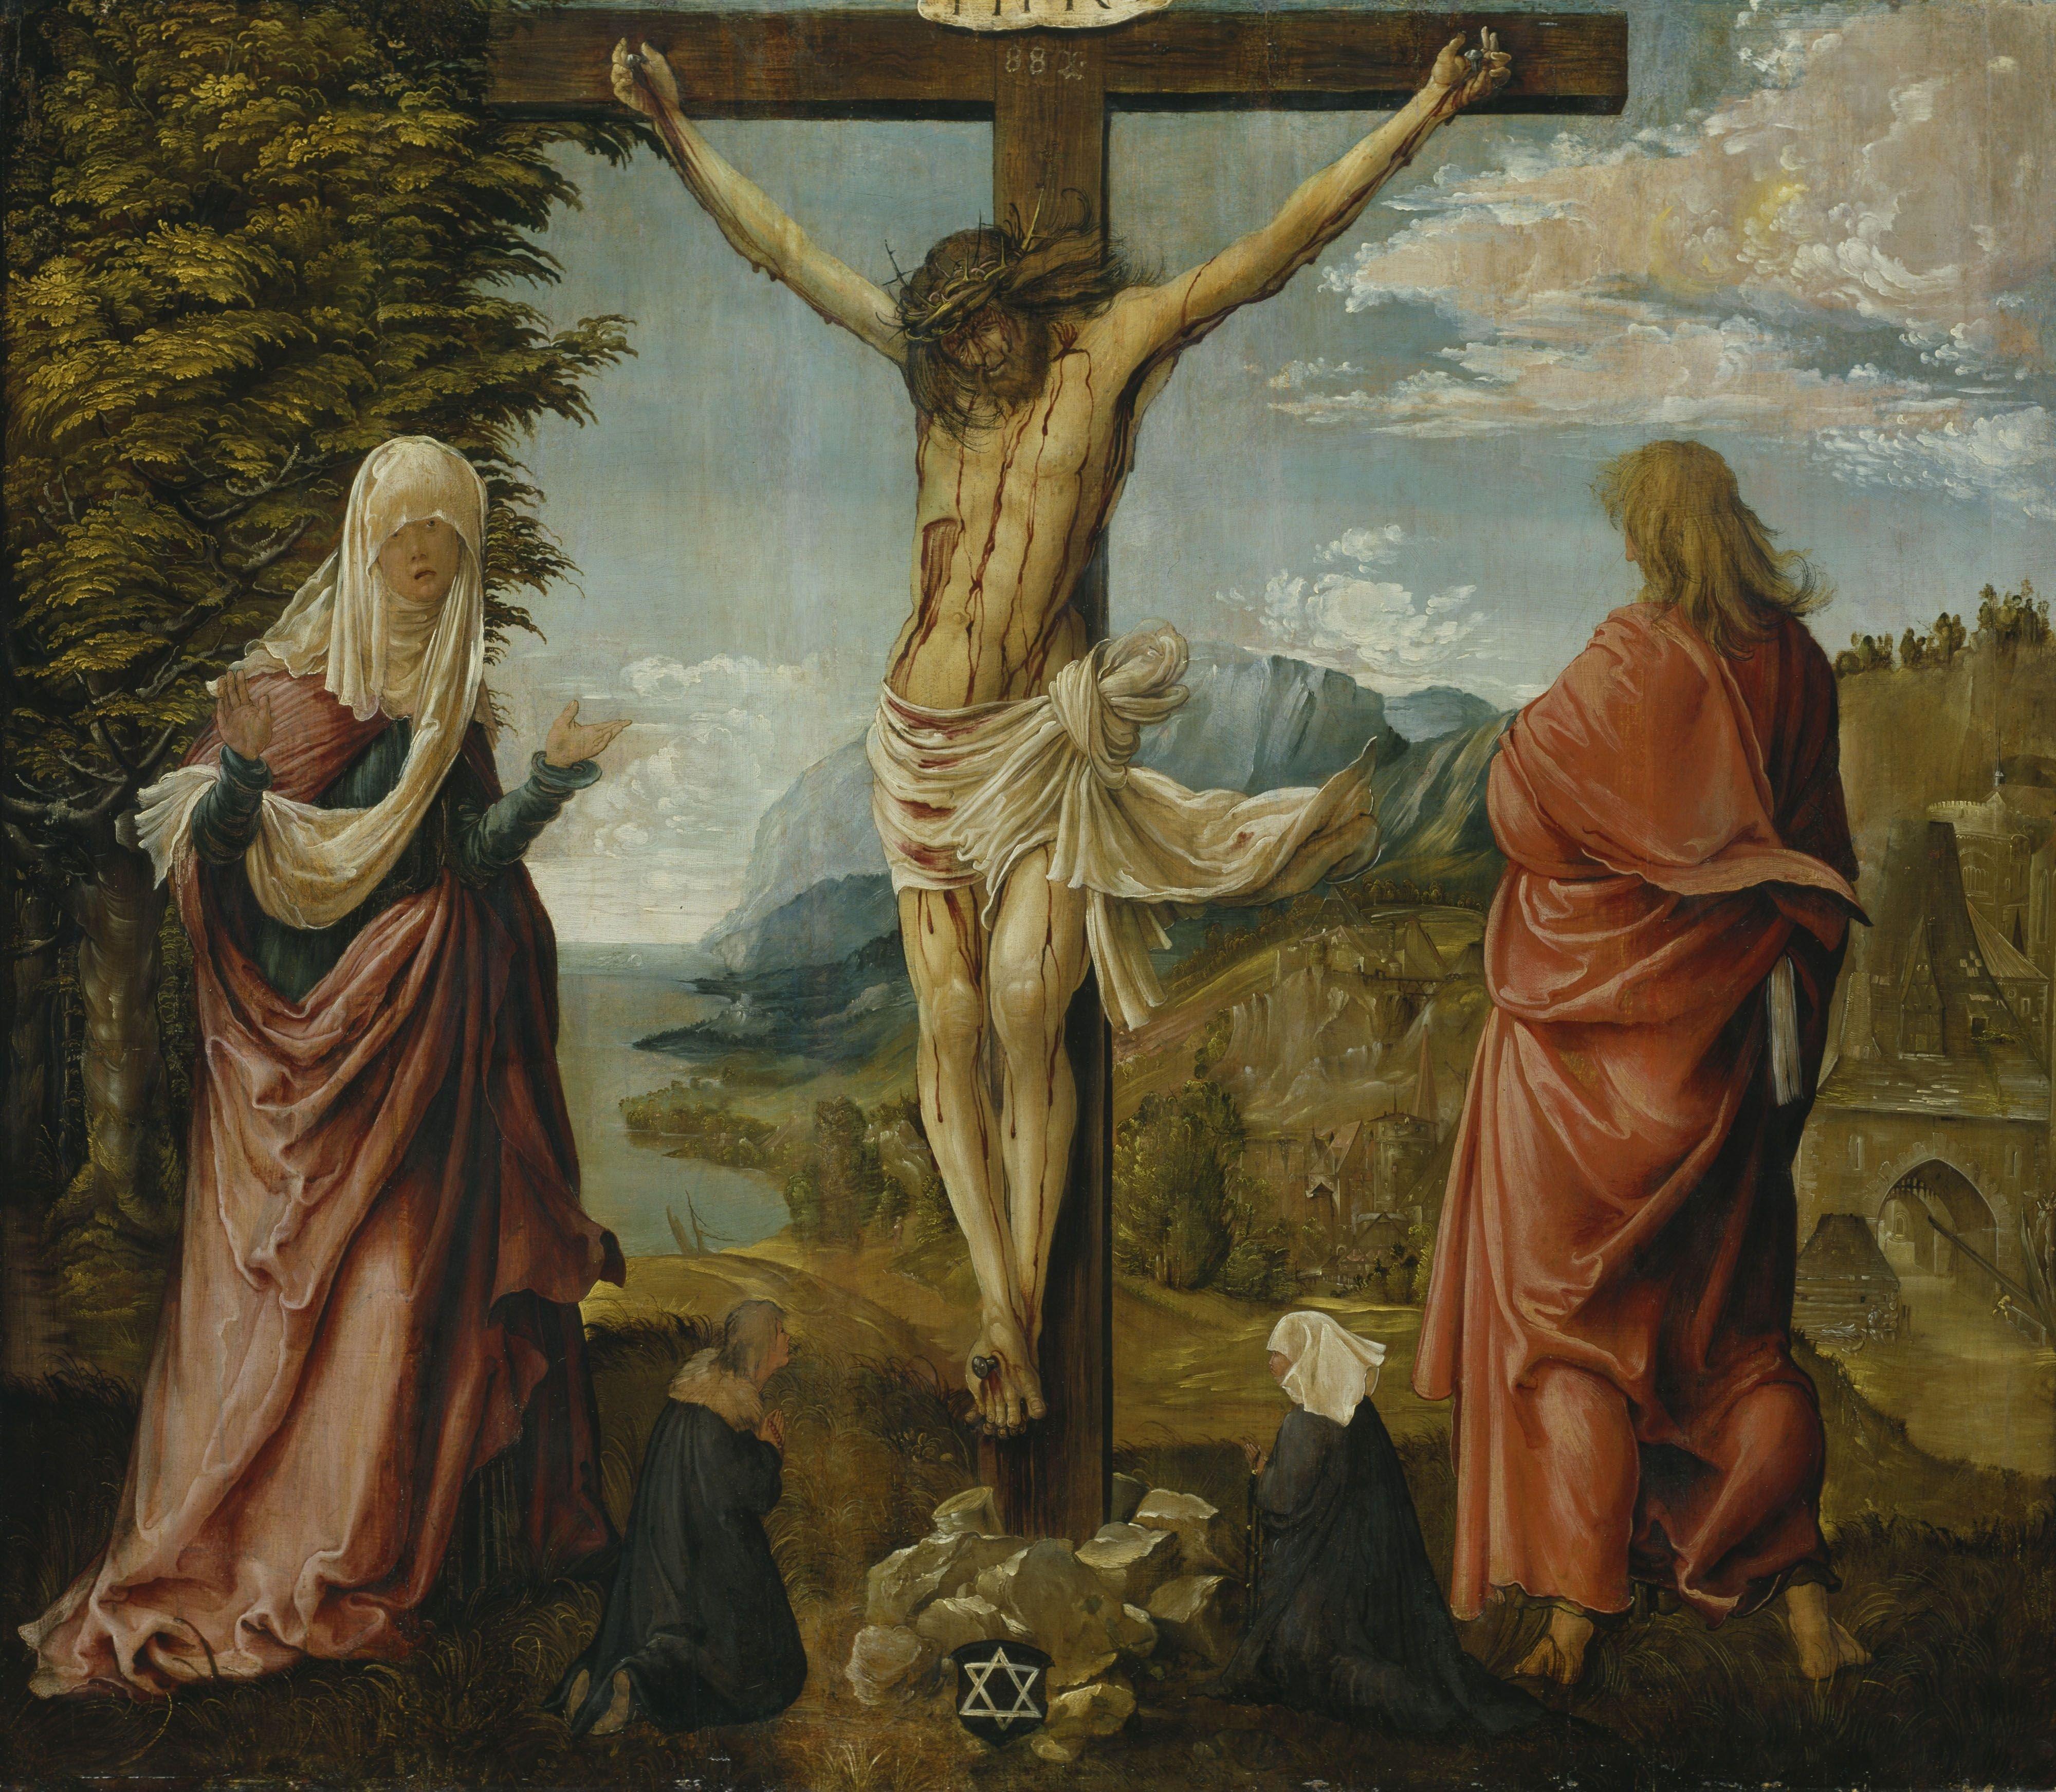 Albrecht_Altdorfer_-_Christ_on_the_Cross_between_Mary_and_St_John_-_WGA00214